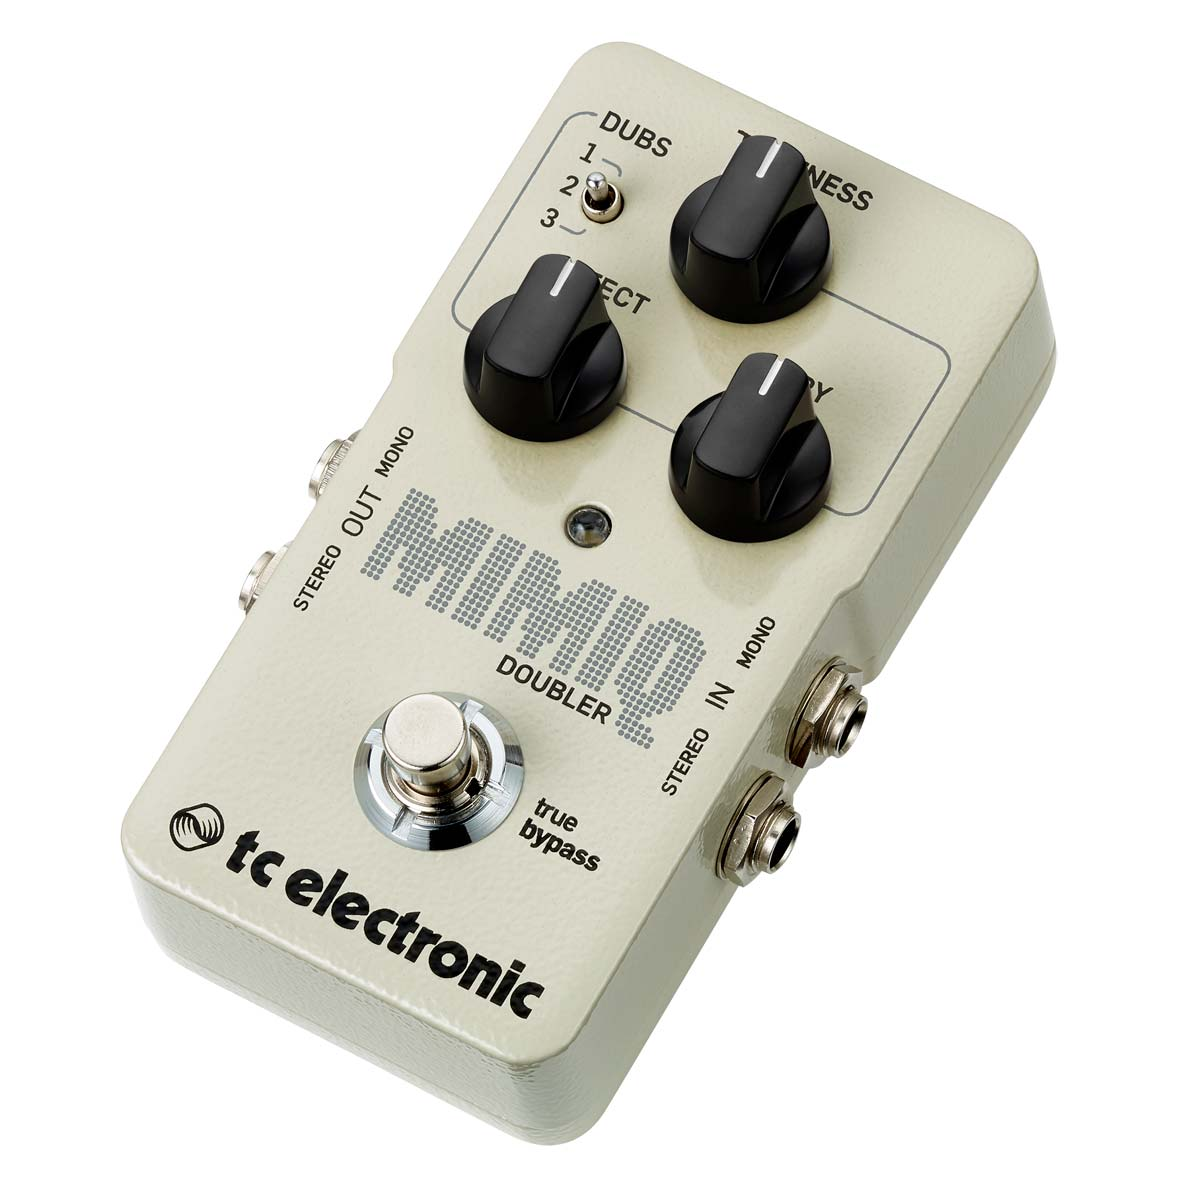 TC Electronic Mimiq Double guitar-effekt-pedal